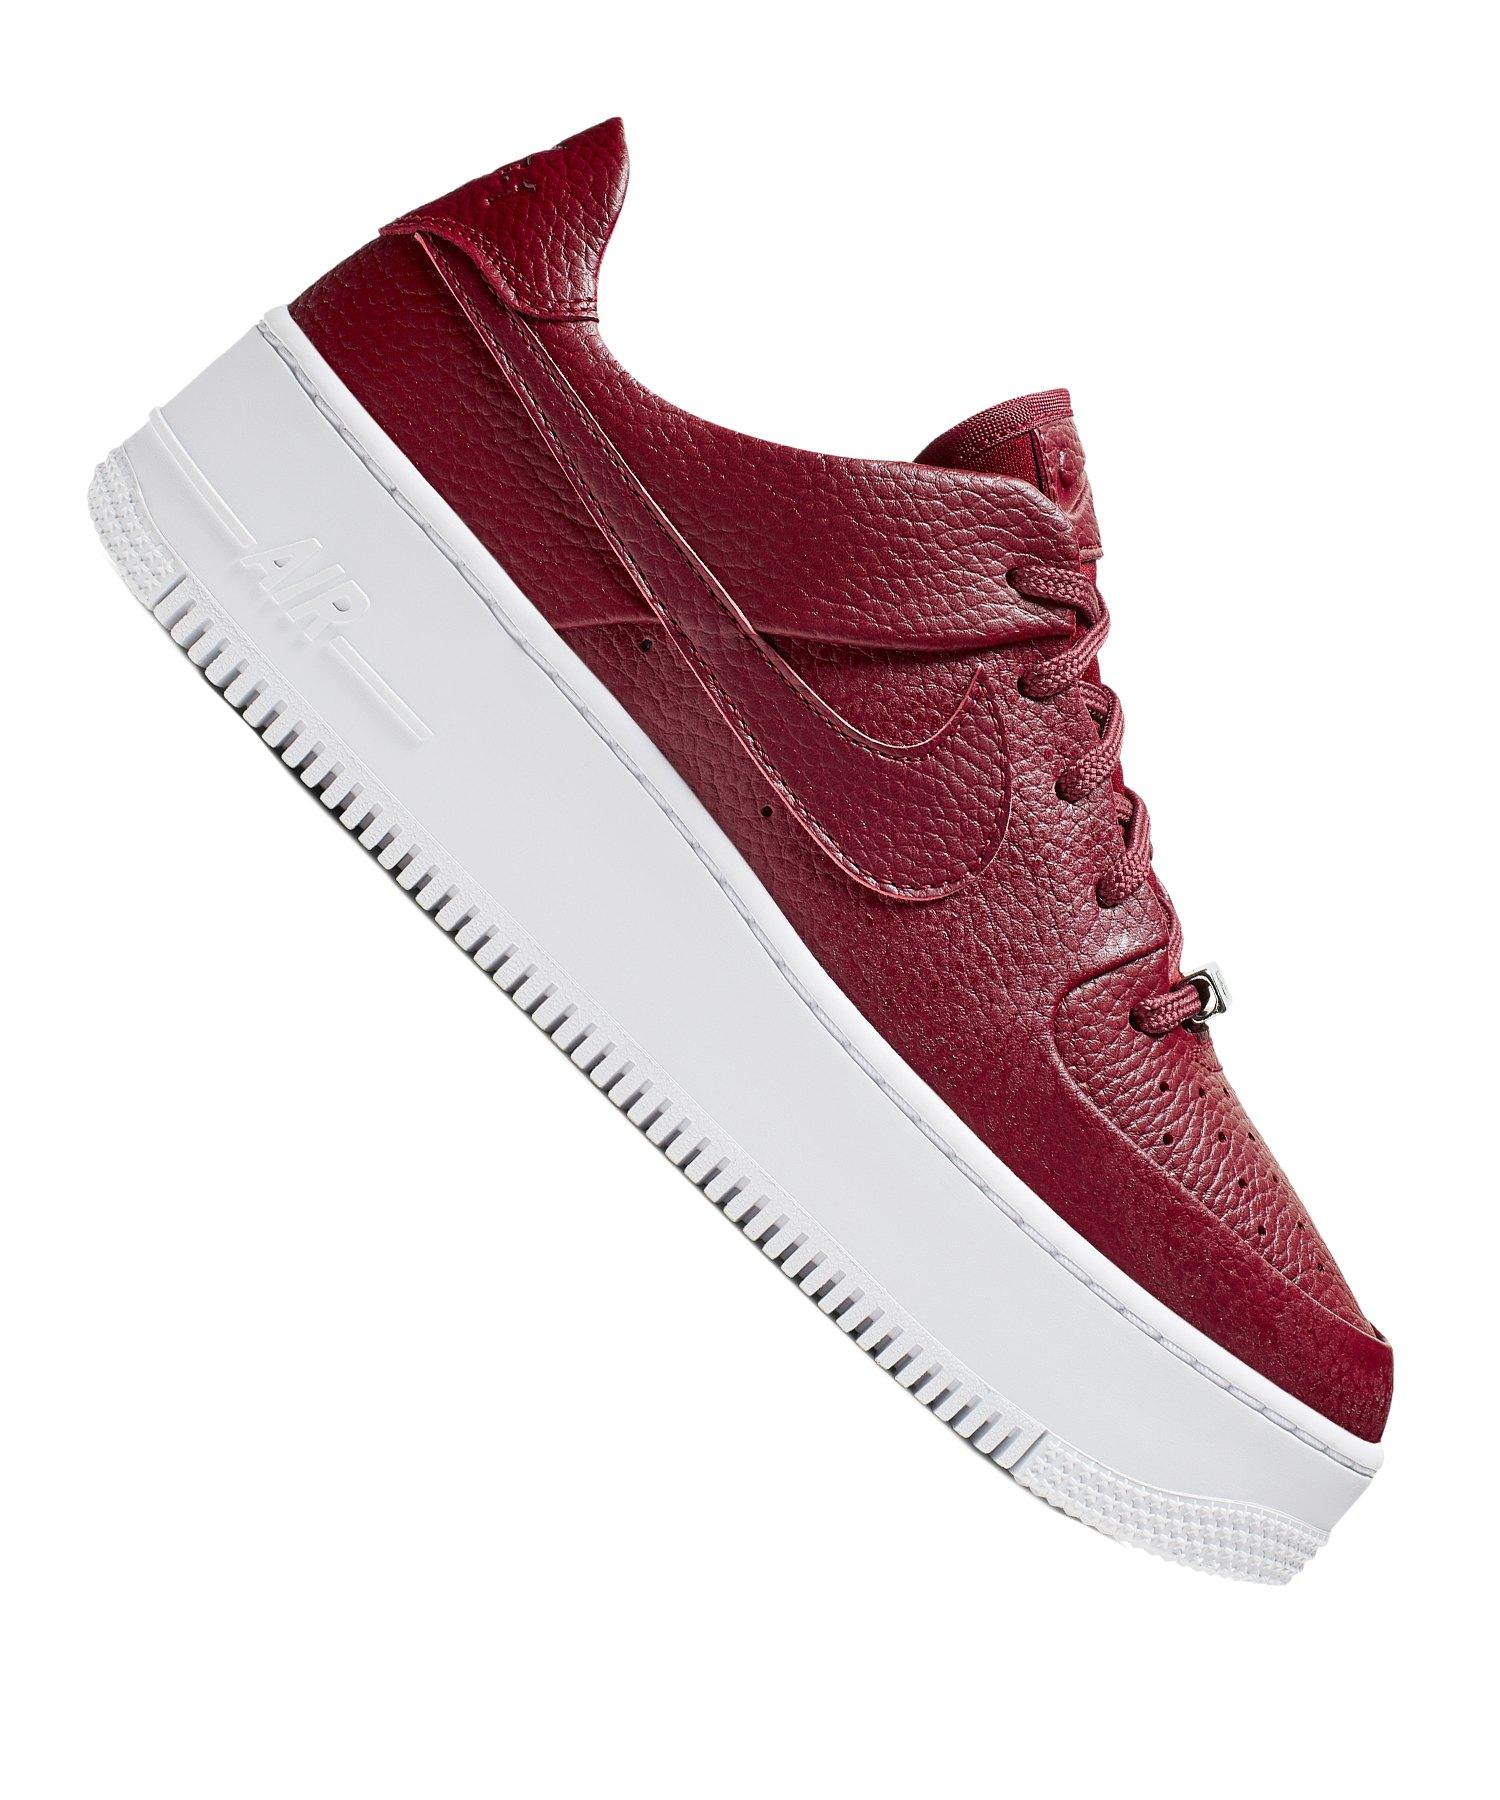 Nike Air Force Frauen rot